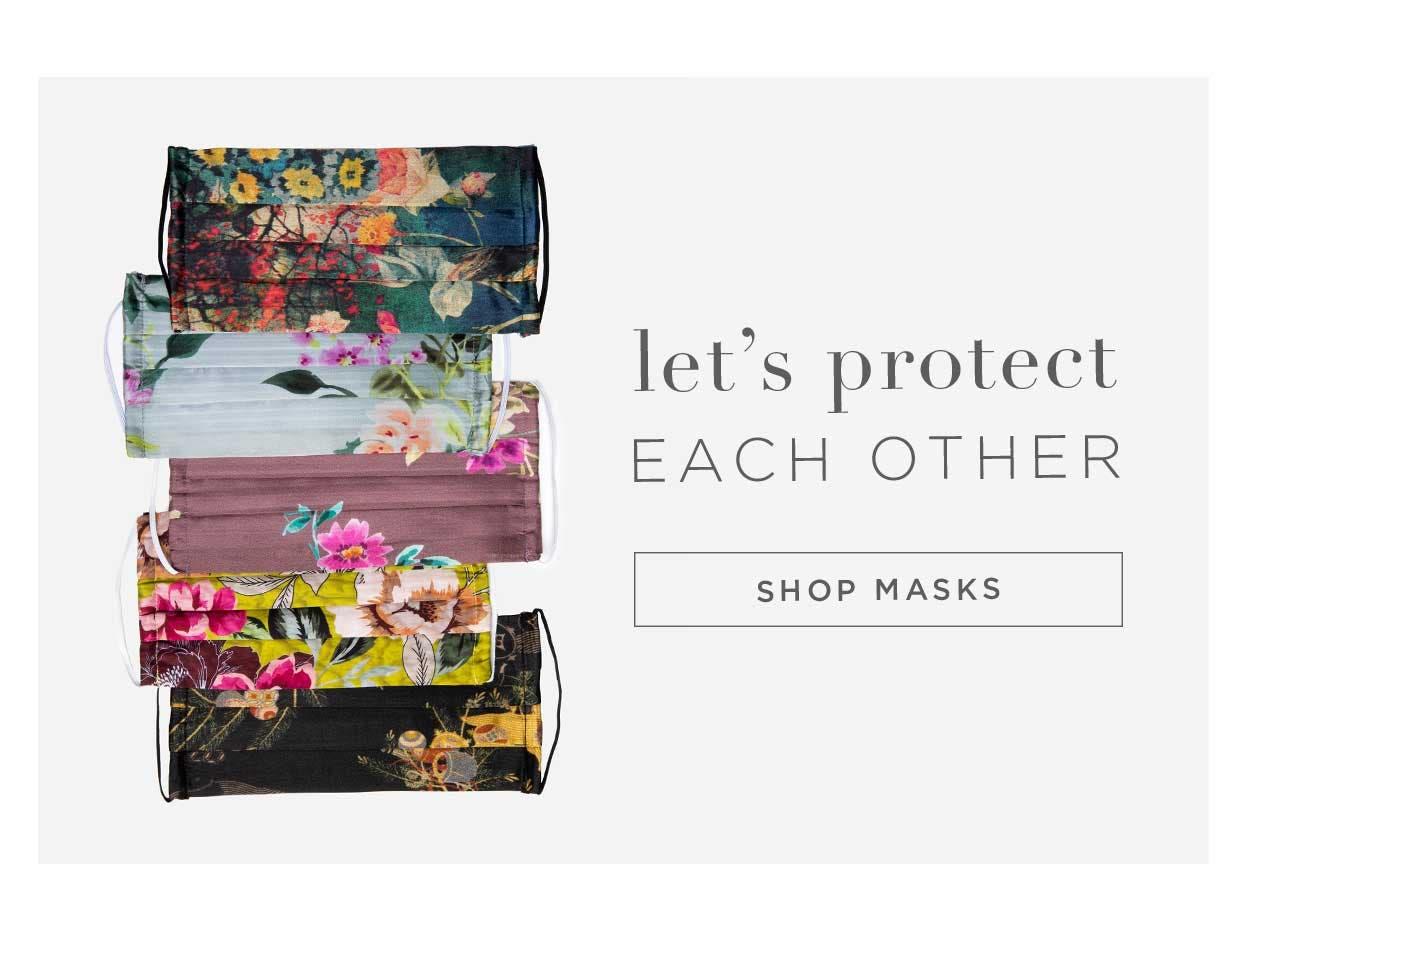 Let's Protect Each Other - Shop Masks